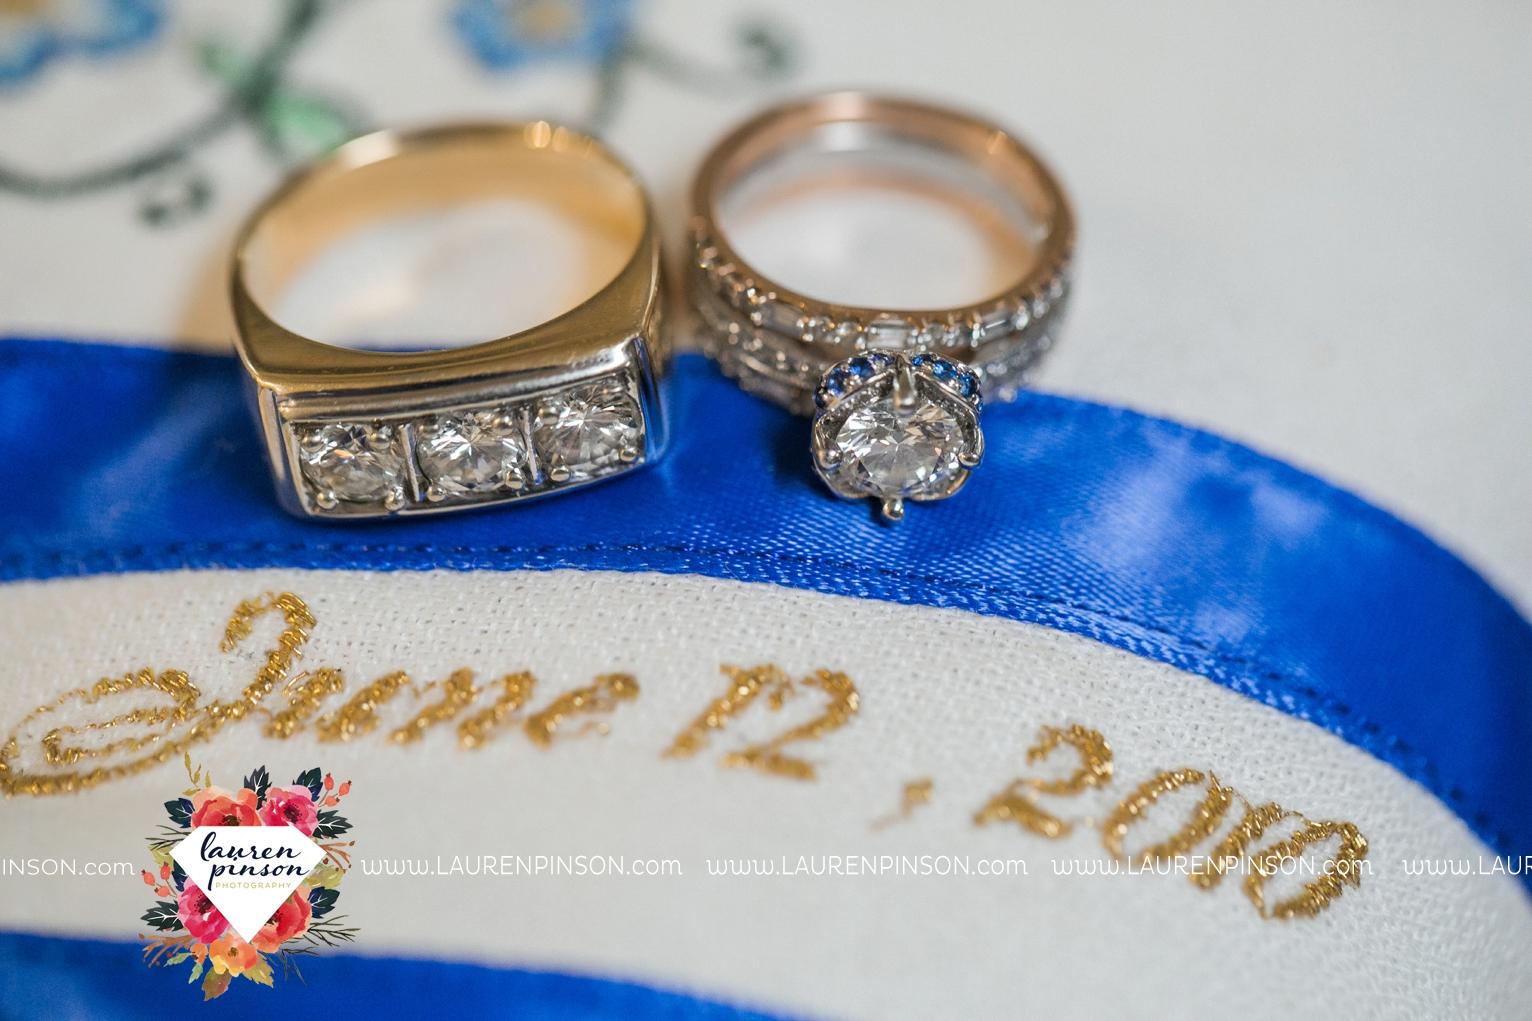 wichita-falls-wedding-photographer-lauren-pinson-at-the-kemp-center-for-the-arts_1618.jpg